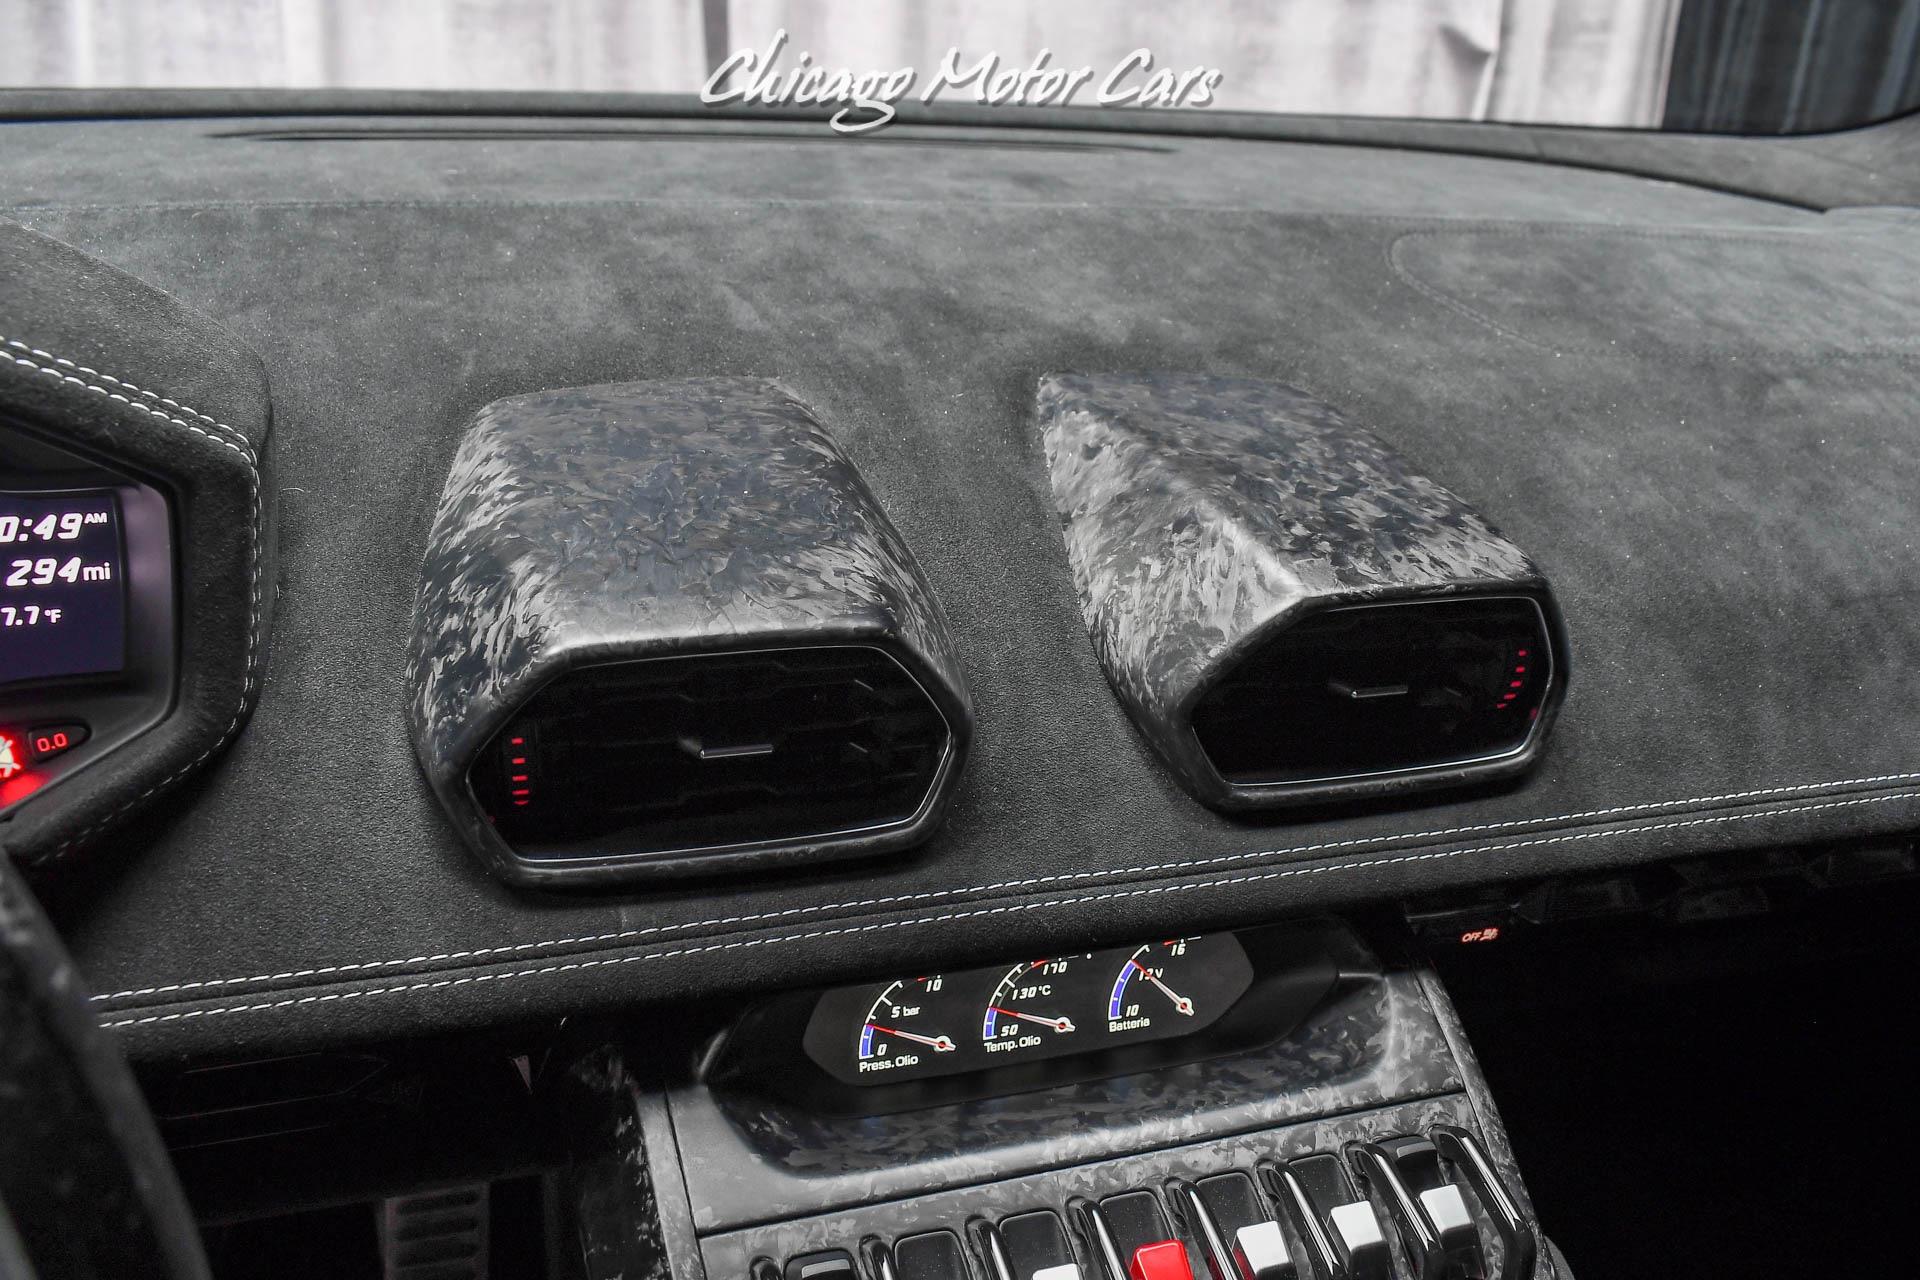 Used-2018-Lamborghini-Performante-Huracan-LP640-4-Performante-Coupe-Rare-Ad-Personam-Viola-Parsifae-Lift-System